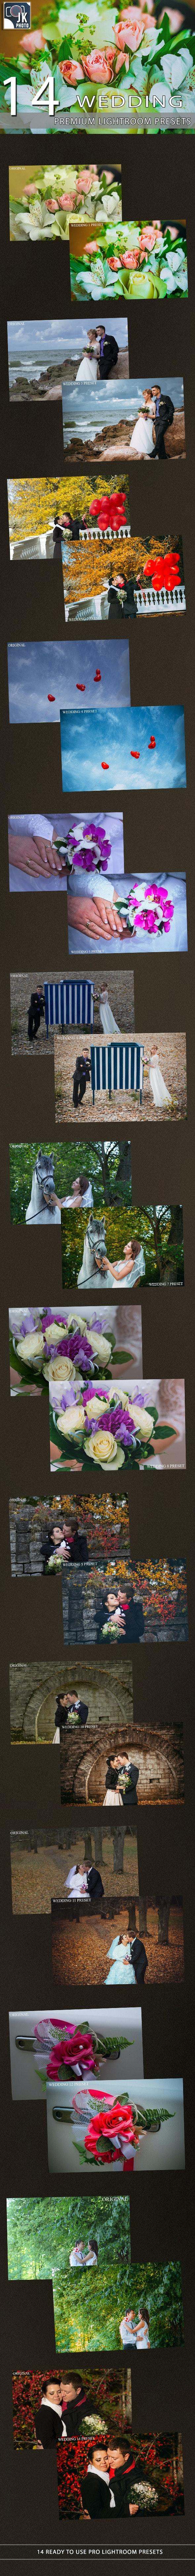 14 Wedding Lightroom Presets - Wedding Lightroom Presets